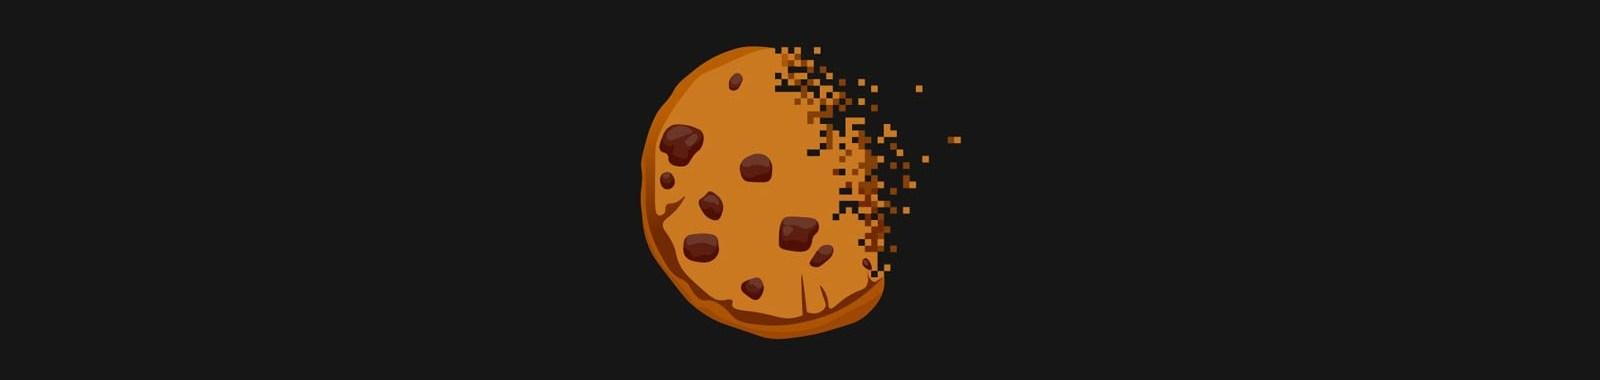 cookie_banner_1440x600-eye